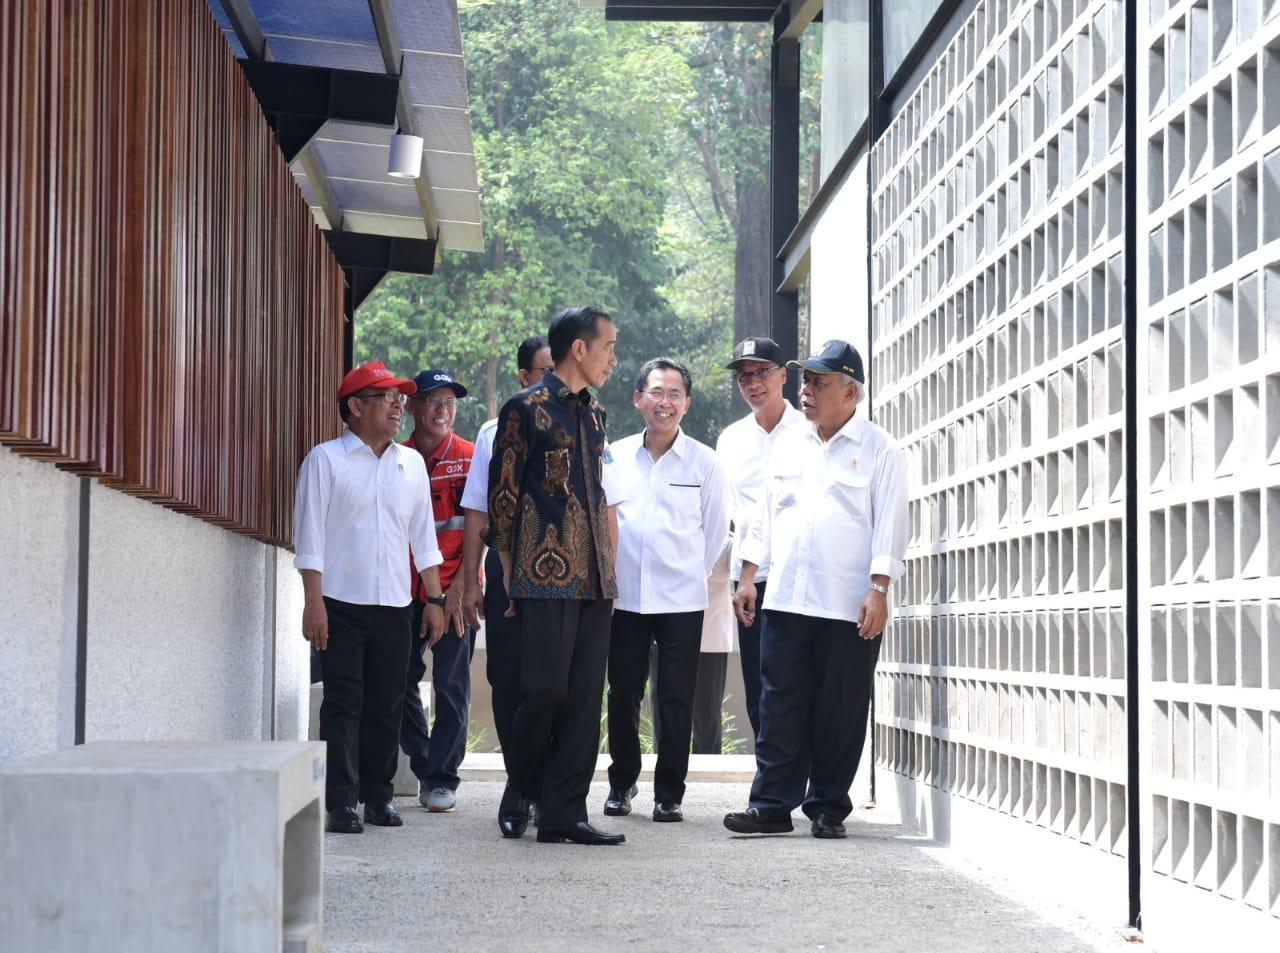 Presiden Jokowi Tinjau Fasilitas Ramah Disabilitas di GBK